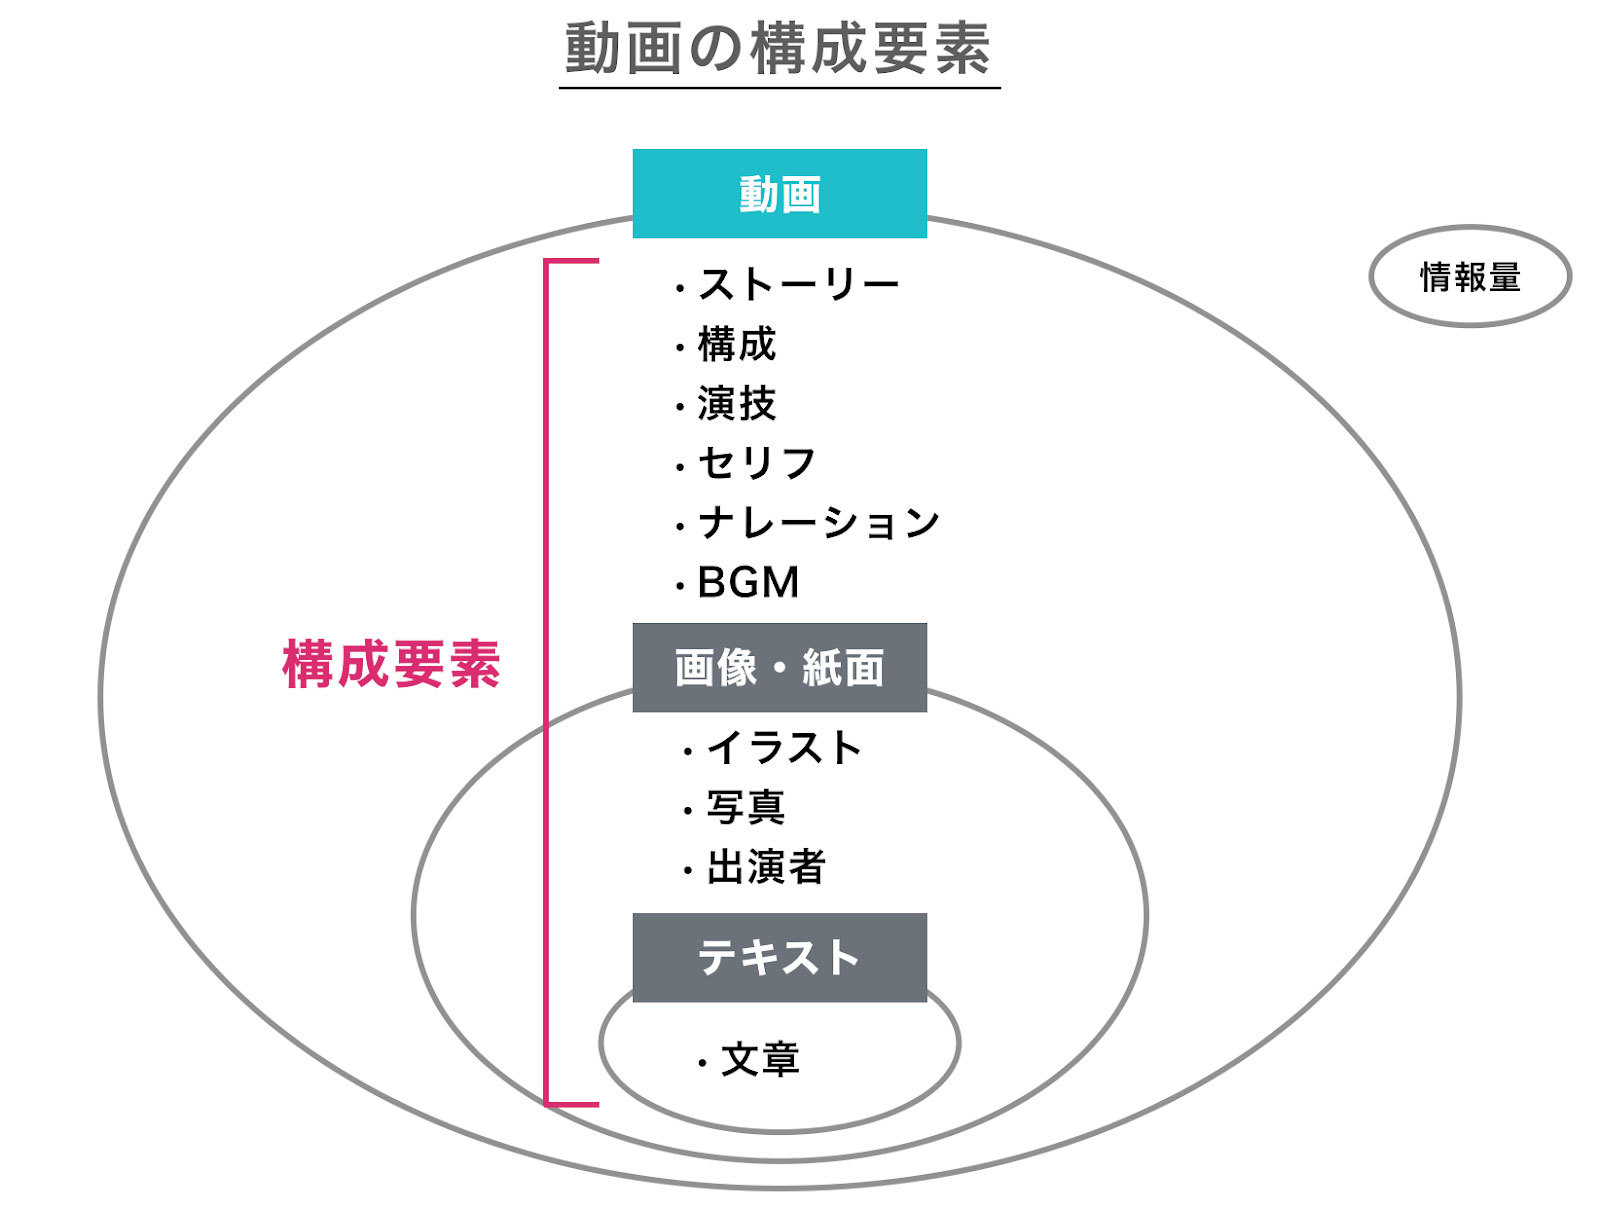 viibar_1-1_img10_構成要素.jpg